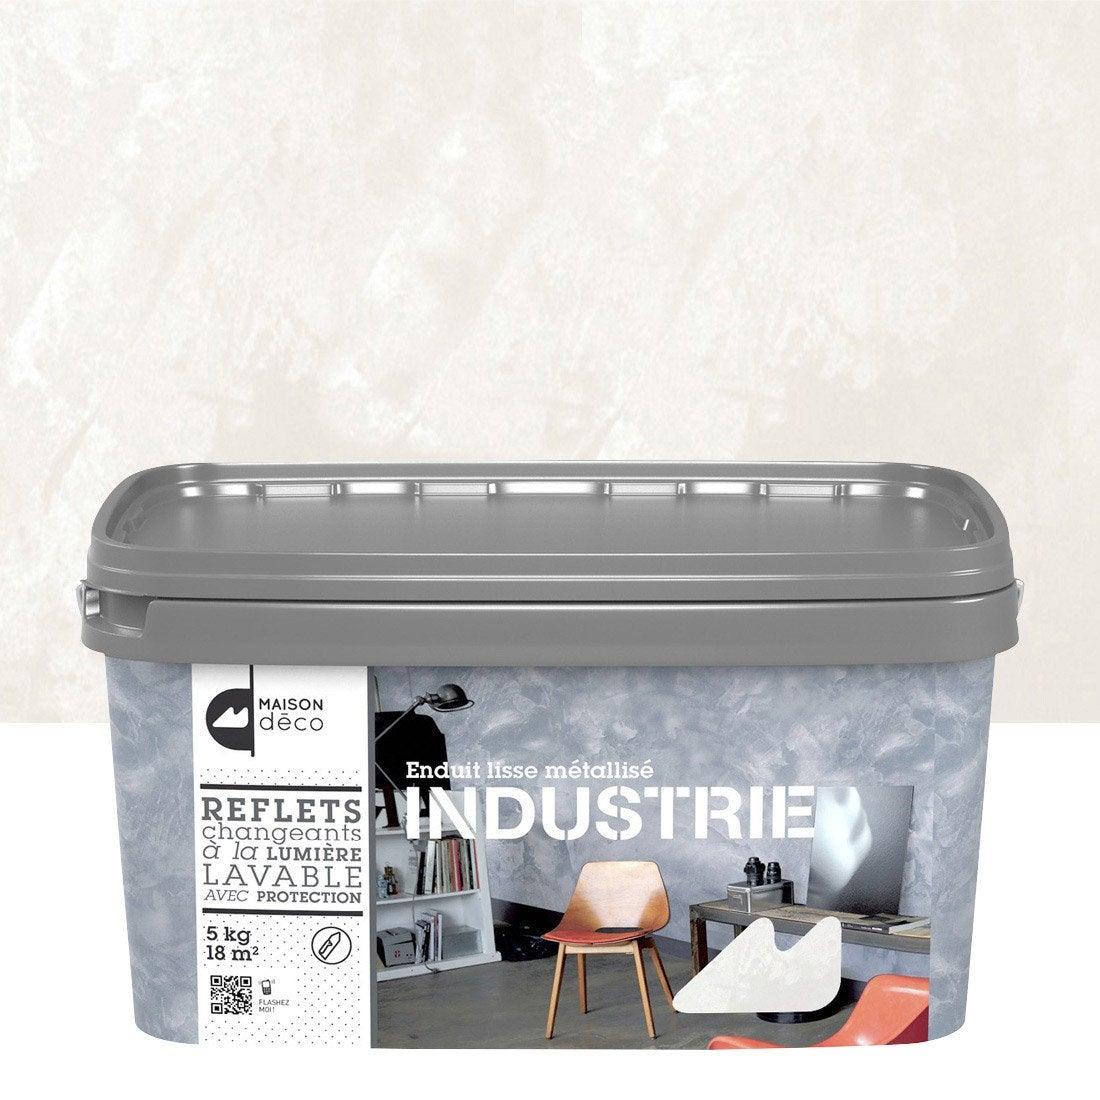 Peinture effet industrie maison deco titane 5 kg - Peinture effet vieilli leroy merlin ...